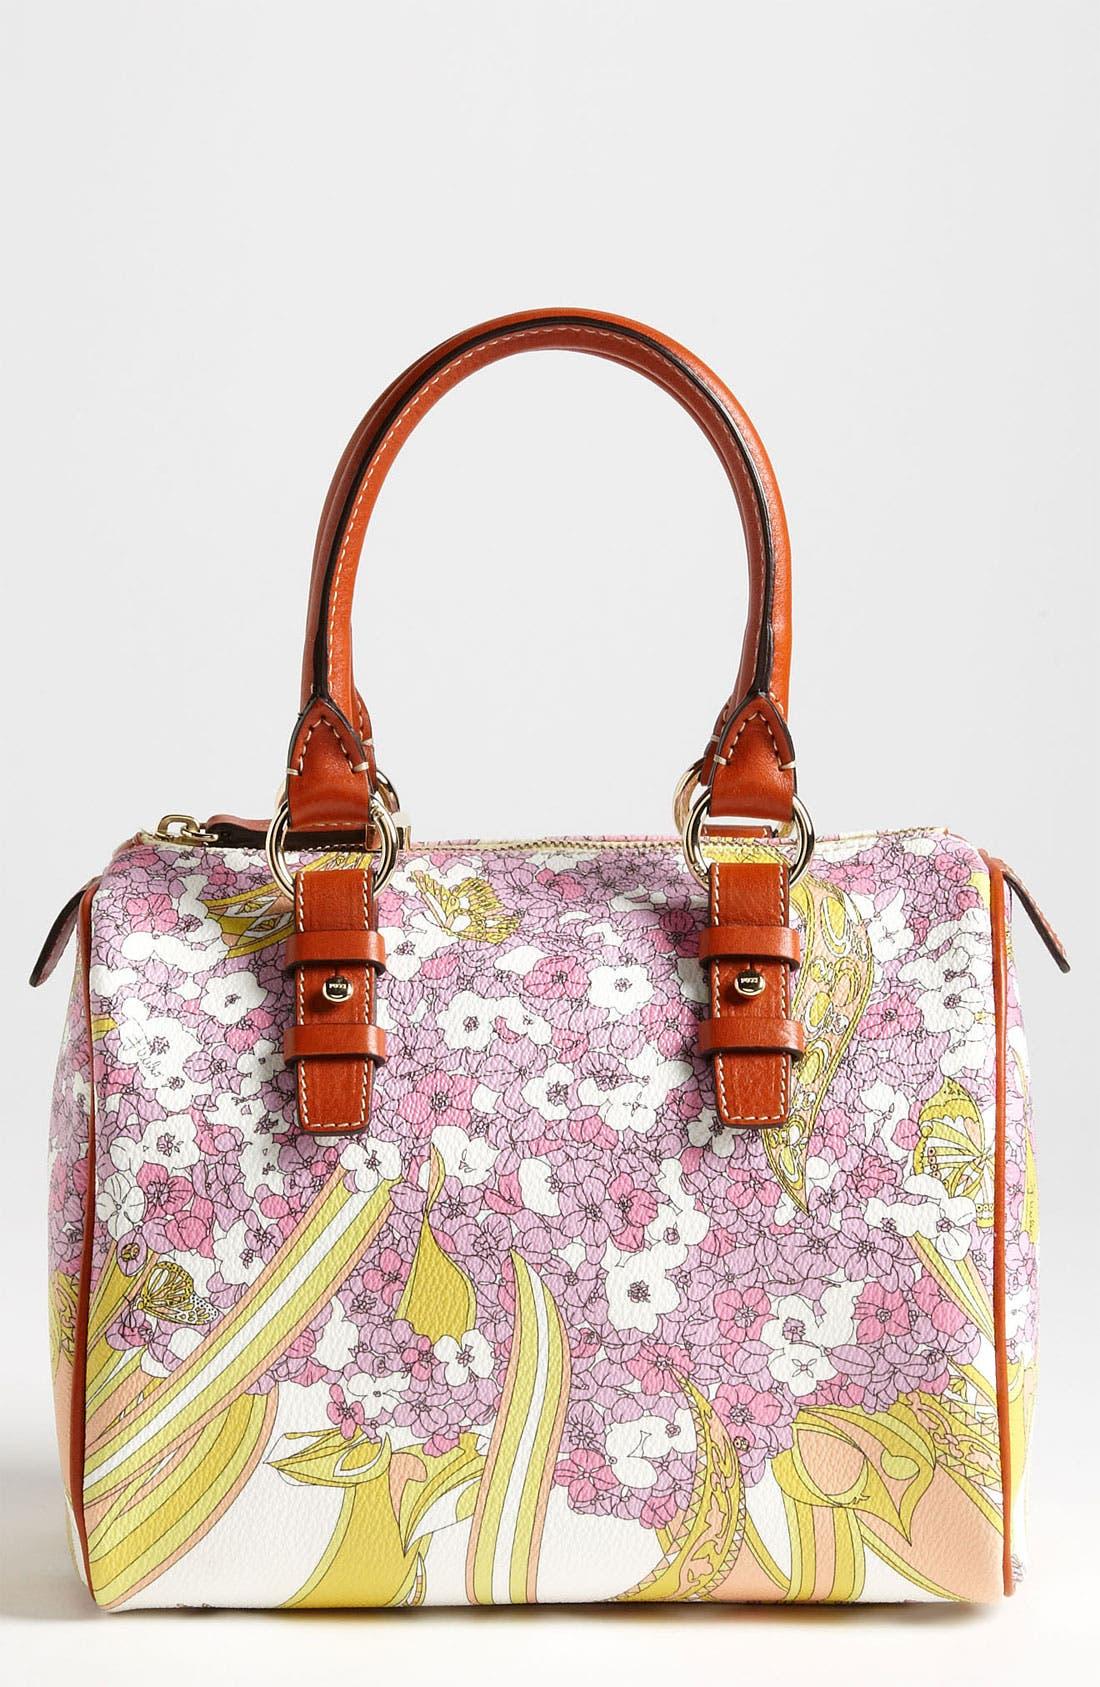 Alternate Image 1 Selected - Emilio Pucci 'Small' Boston Bag